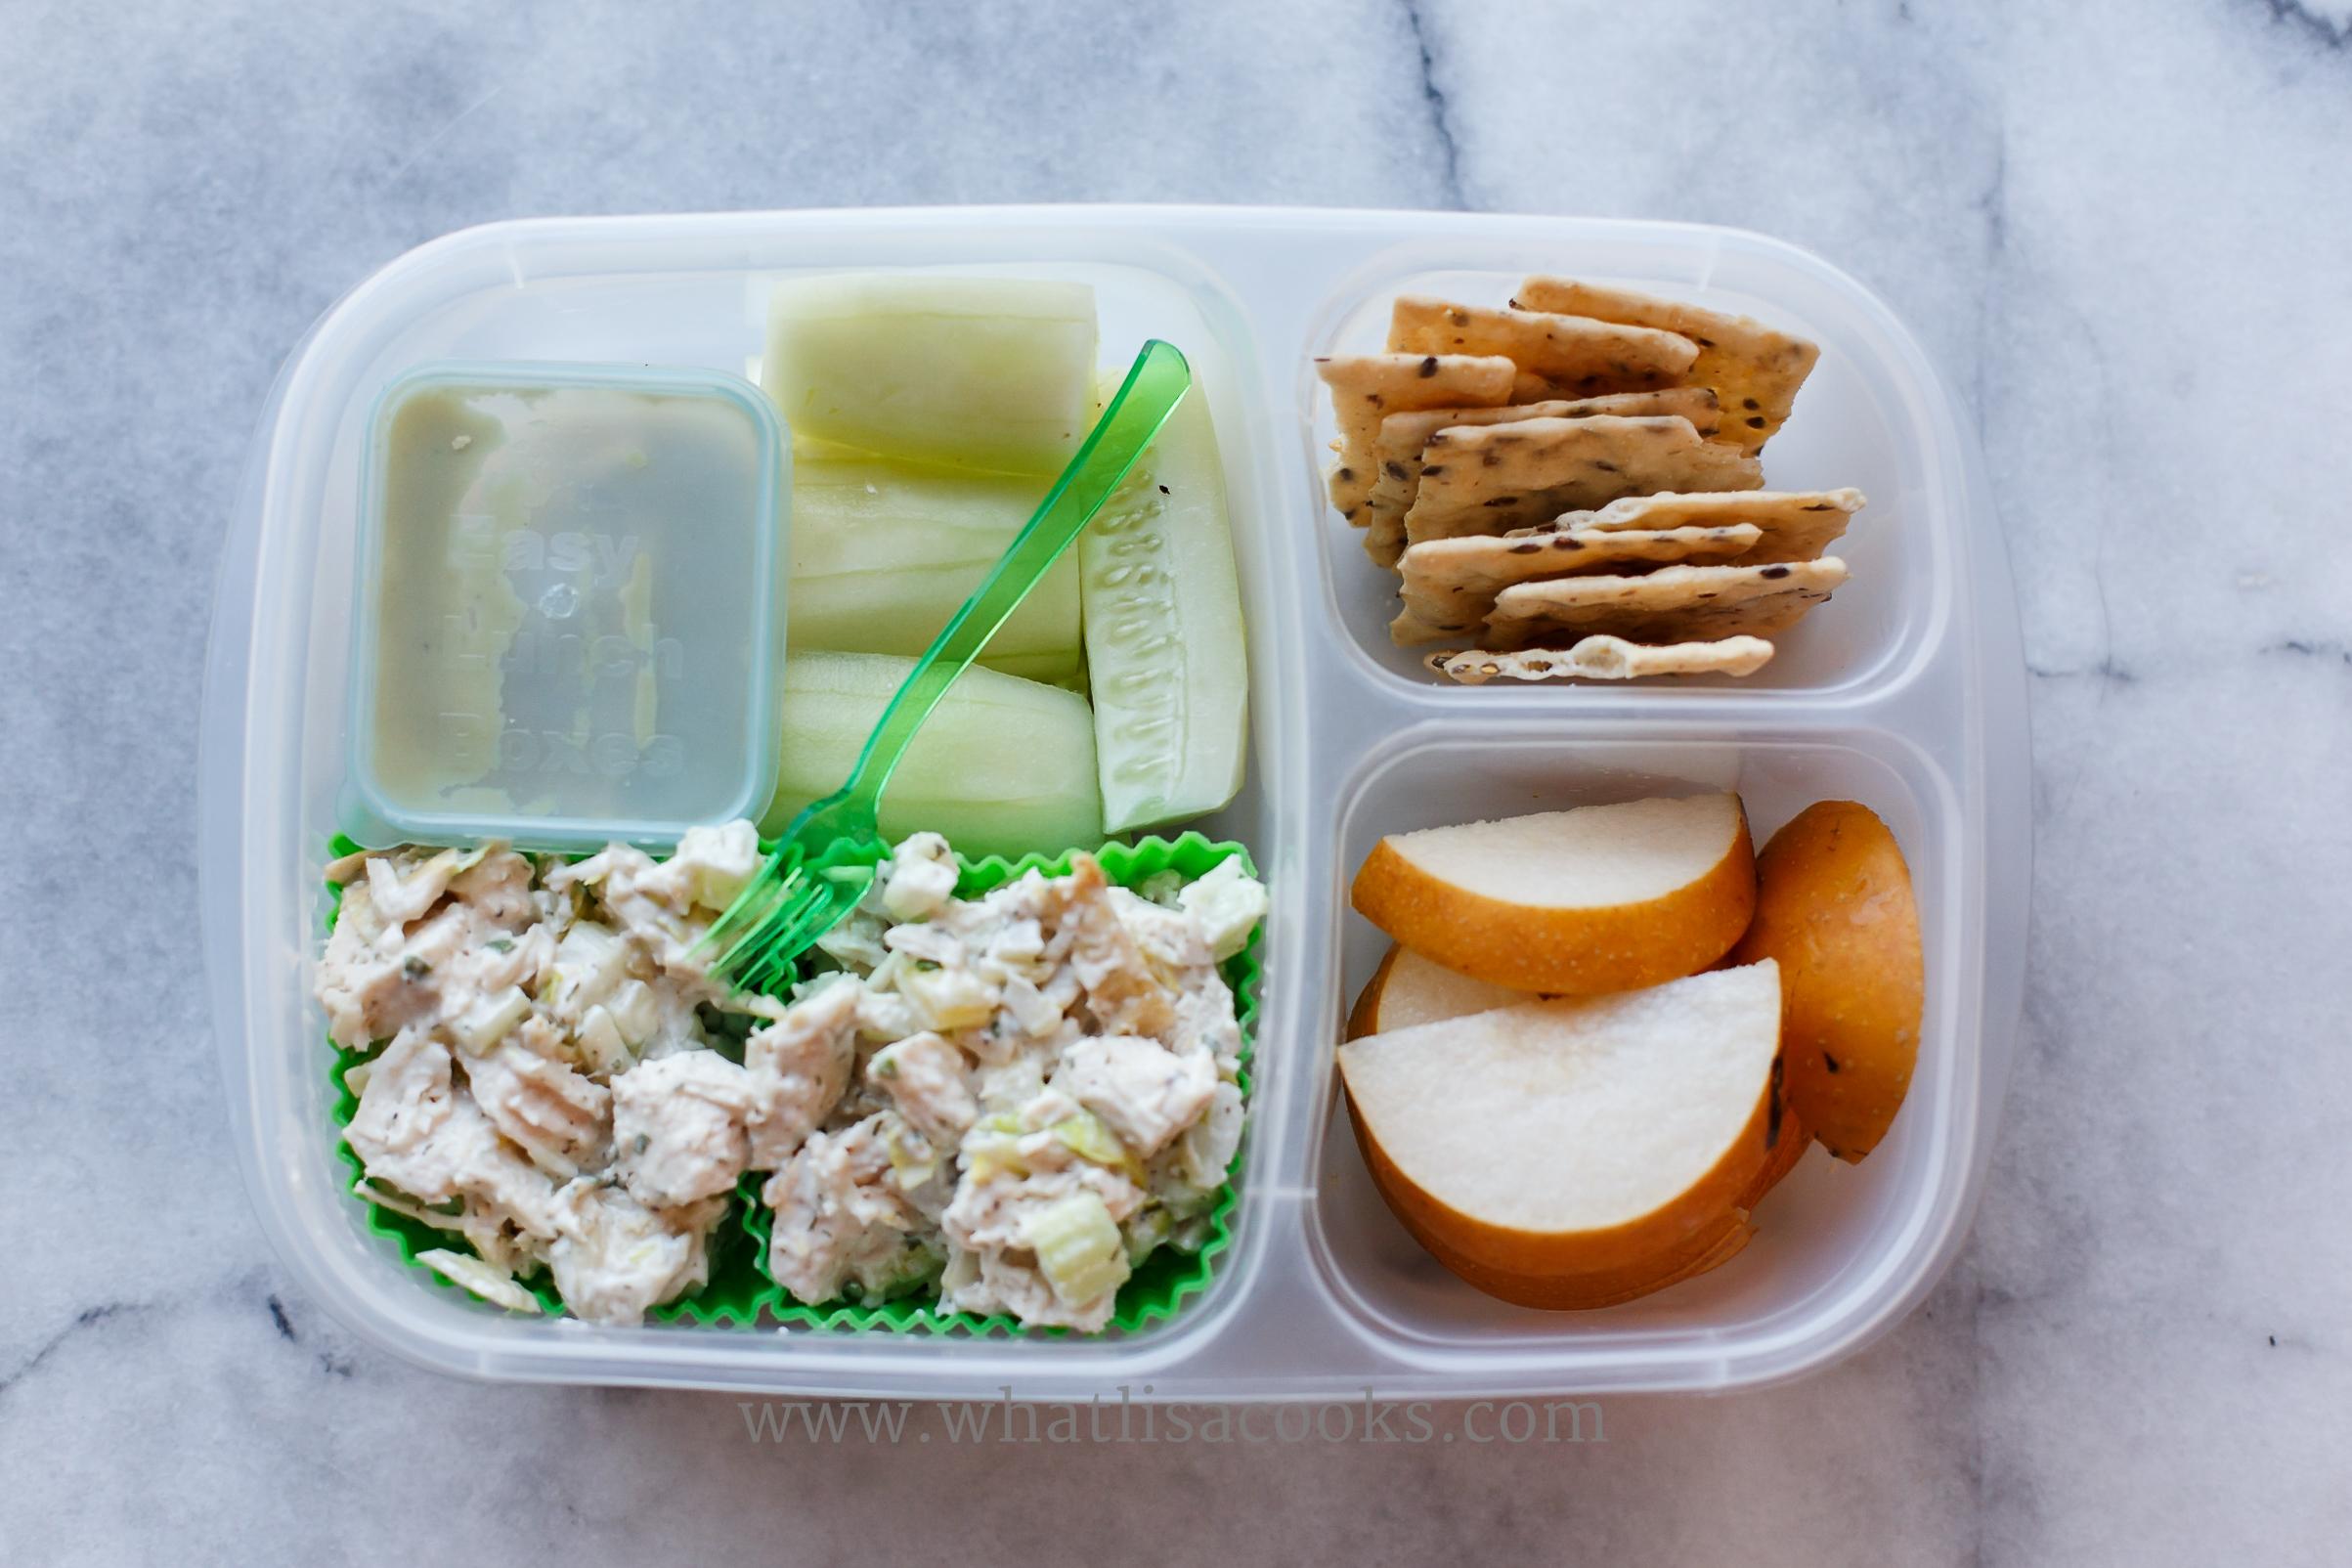 Tarragon chicken salad, cucumbers, guacamole, pears, rice crackers.